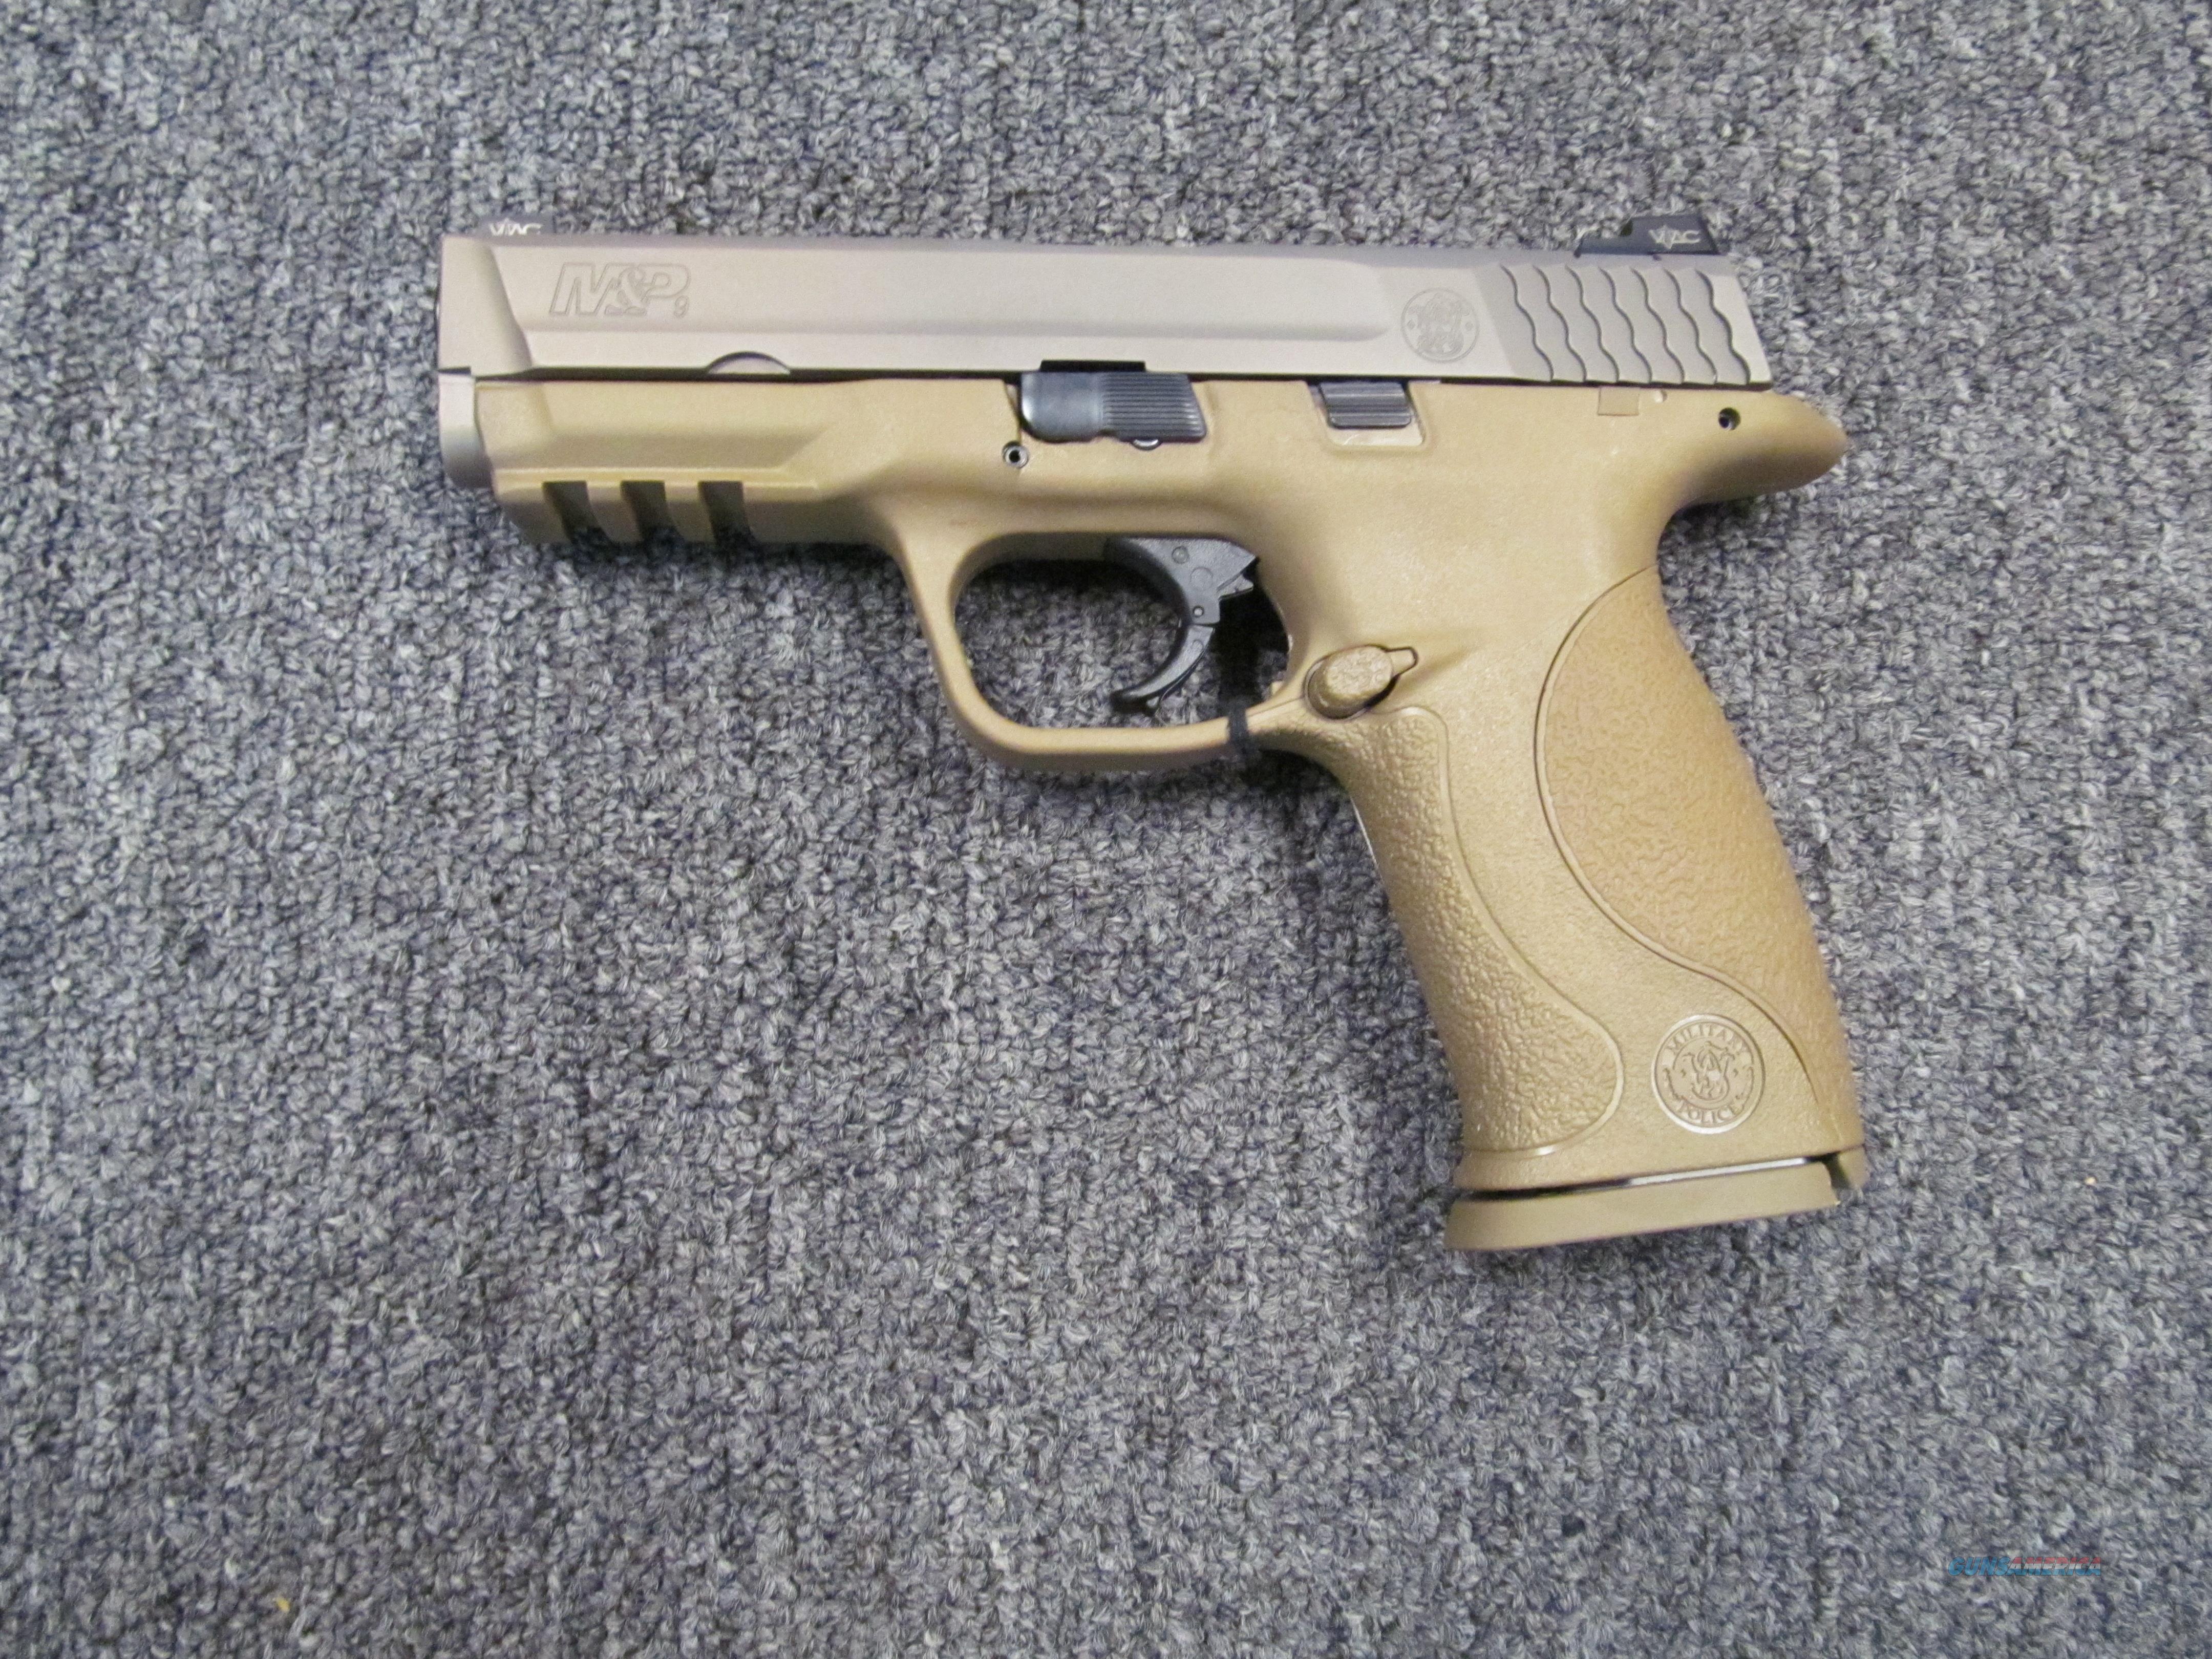 Smith & Wesson M&P9 VTAC  Guns > Pistols > Smith & Wesson Pistols - Autos > Polymer Frame